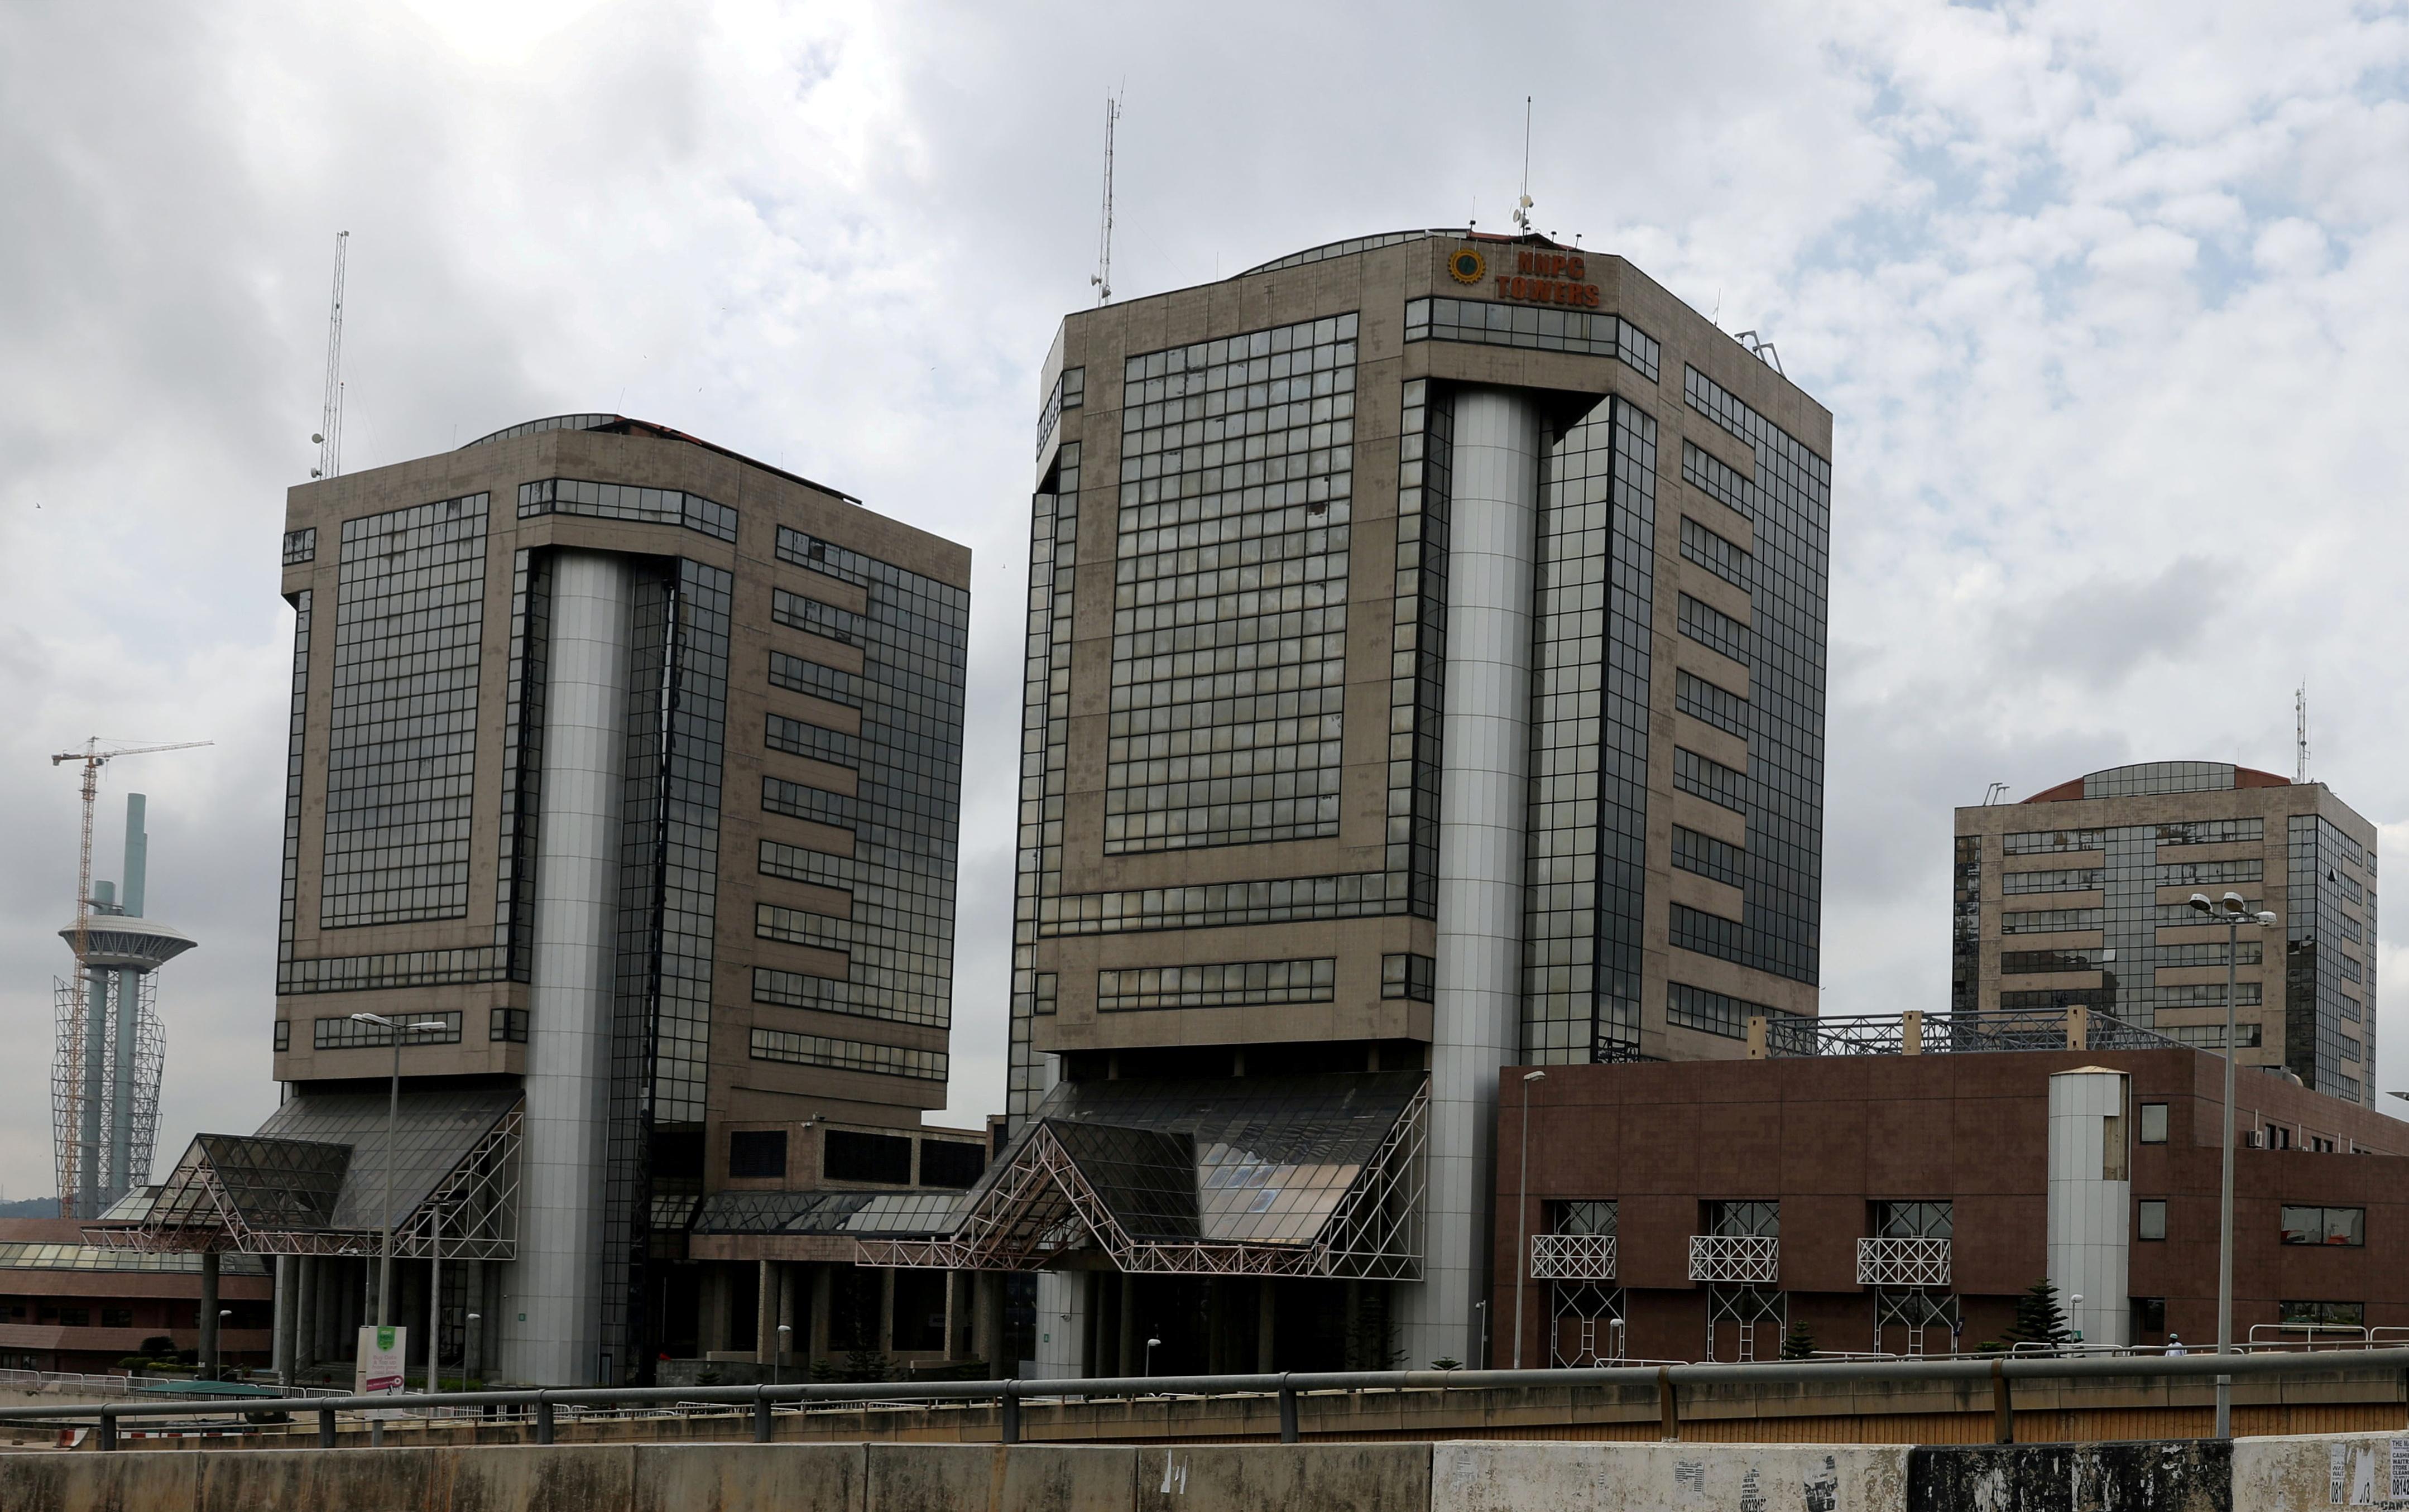 Nigerian National Petroleum Corporation (NNPC) headquarters are seen in Abuja, Nigeria July 28, 2017. REUTERS/Afolabi Sotunde